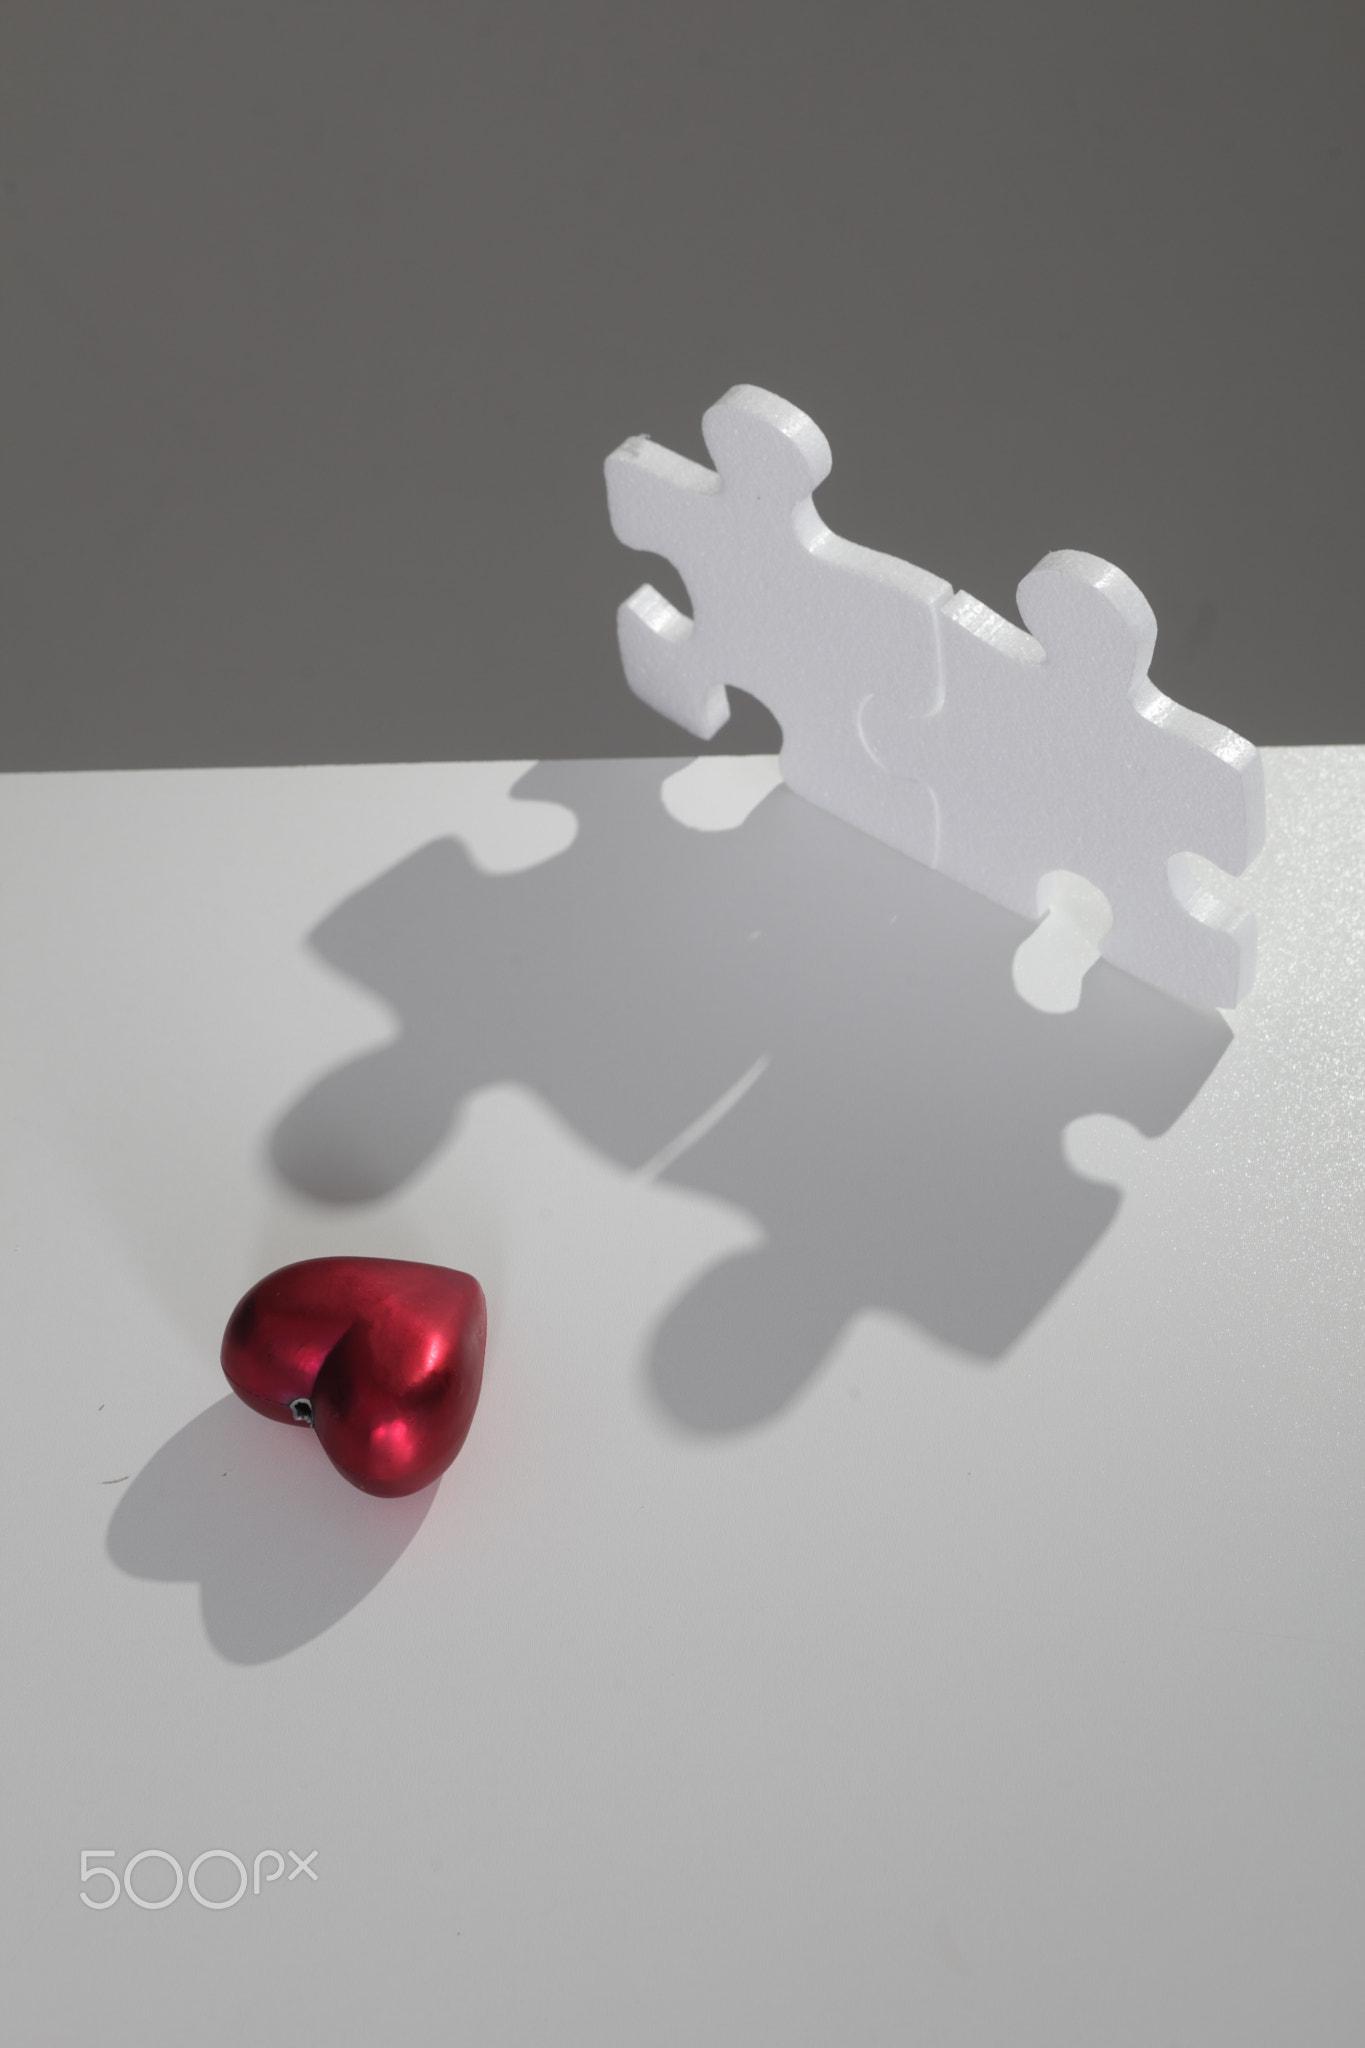 solution jigsaw